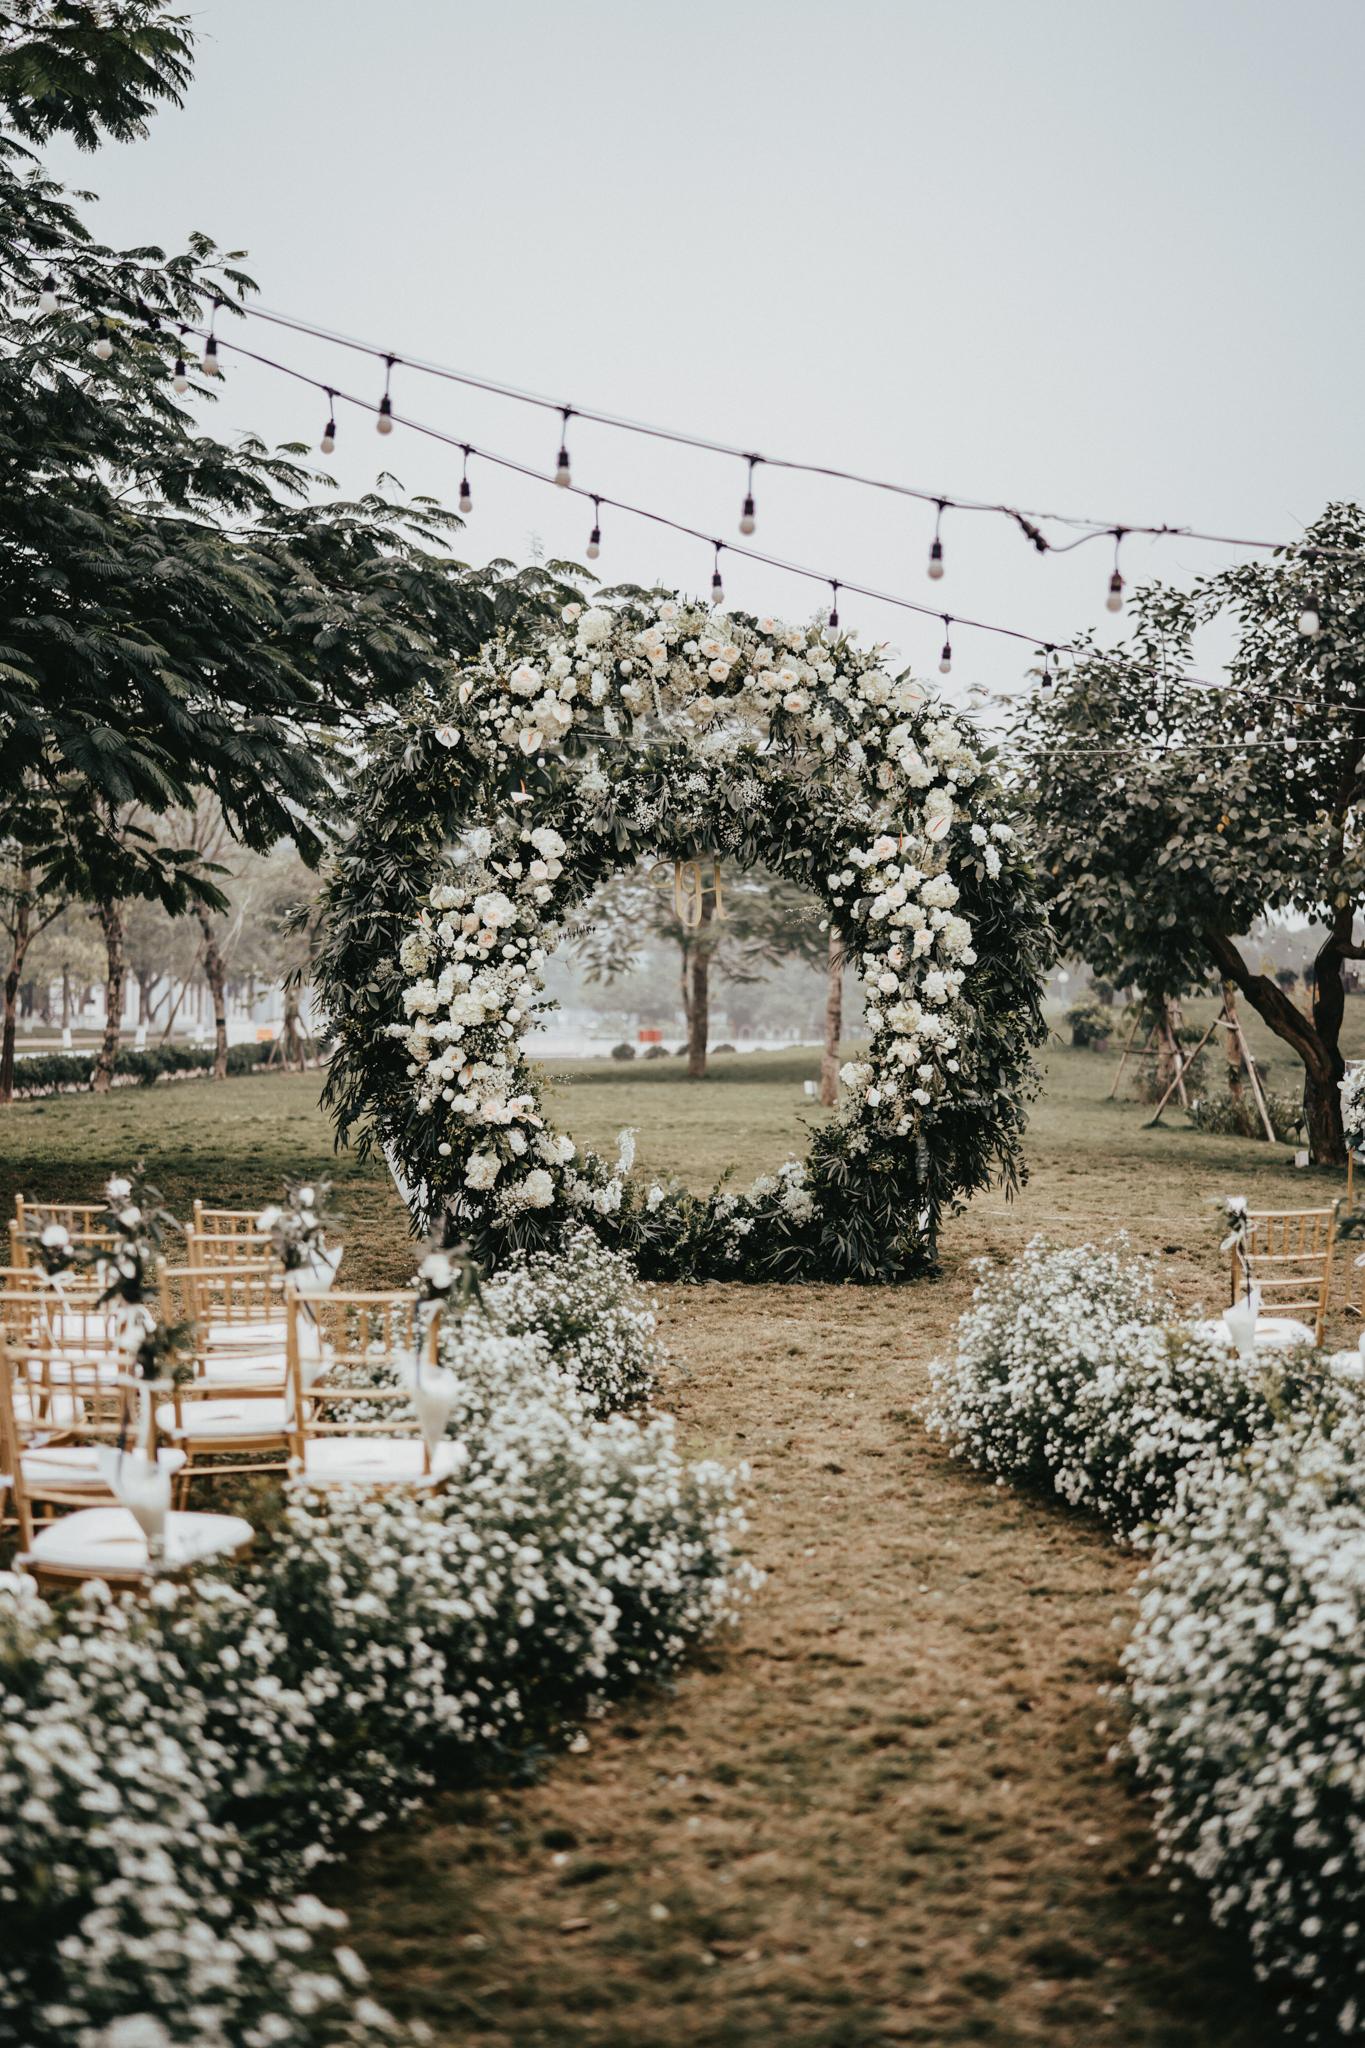 JWMarriott Ha Noi Intimate Wedding of Trang Hi well captured by Hipster Wedding Vietnam Wedding Photographer-97193.jpg